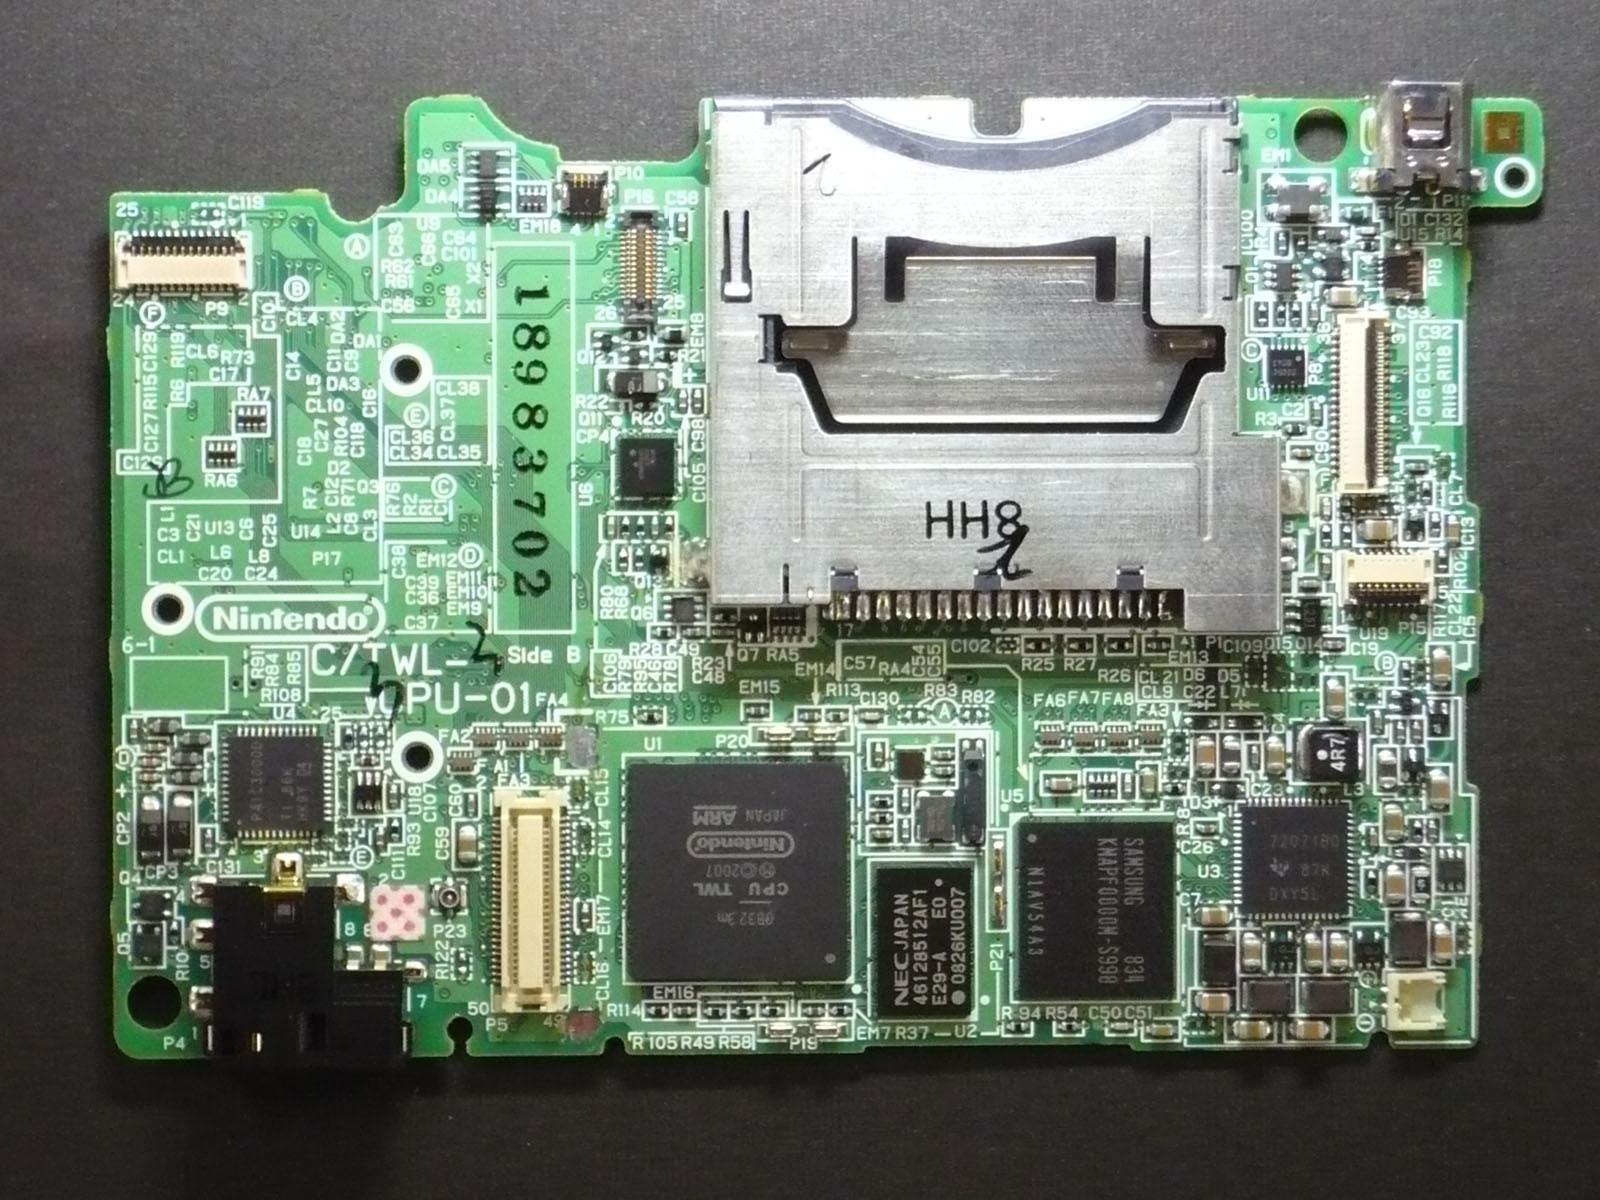 nintendo dsi sells out quickly reviews coming in slashdot rh games slashdot org Nintendo DSi XL Nintendo DS Lite